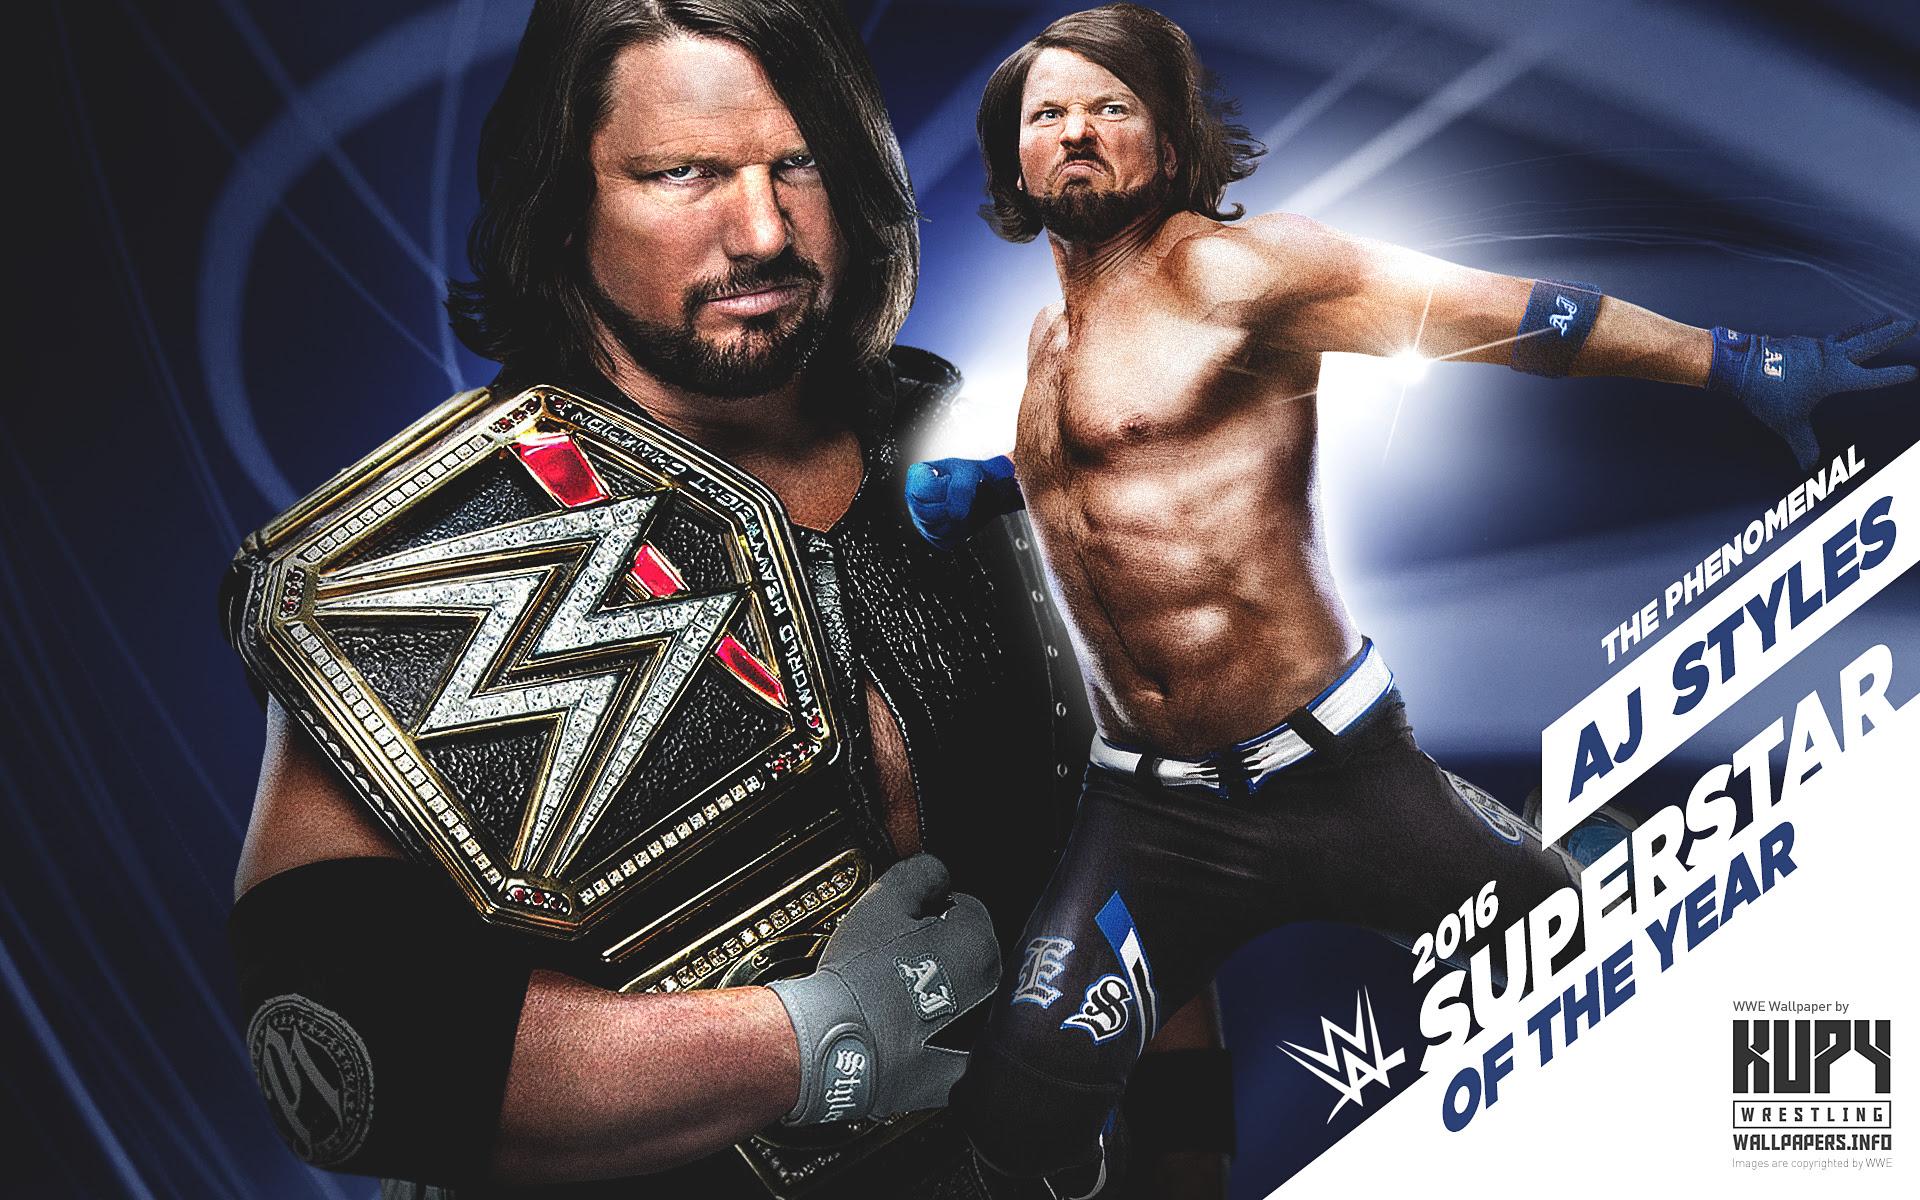 WWE AJ Lee Wallpapers - Wallpaper Cave